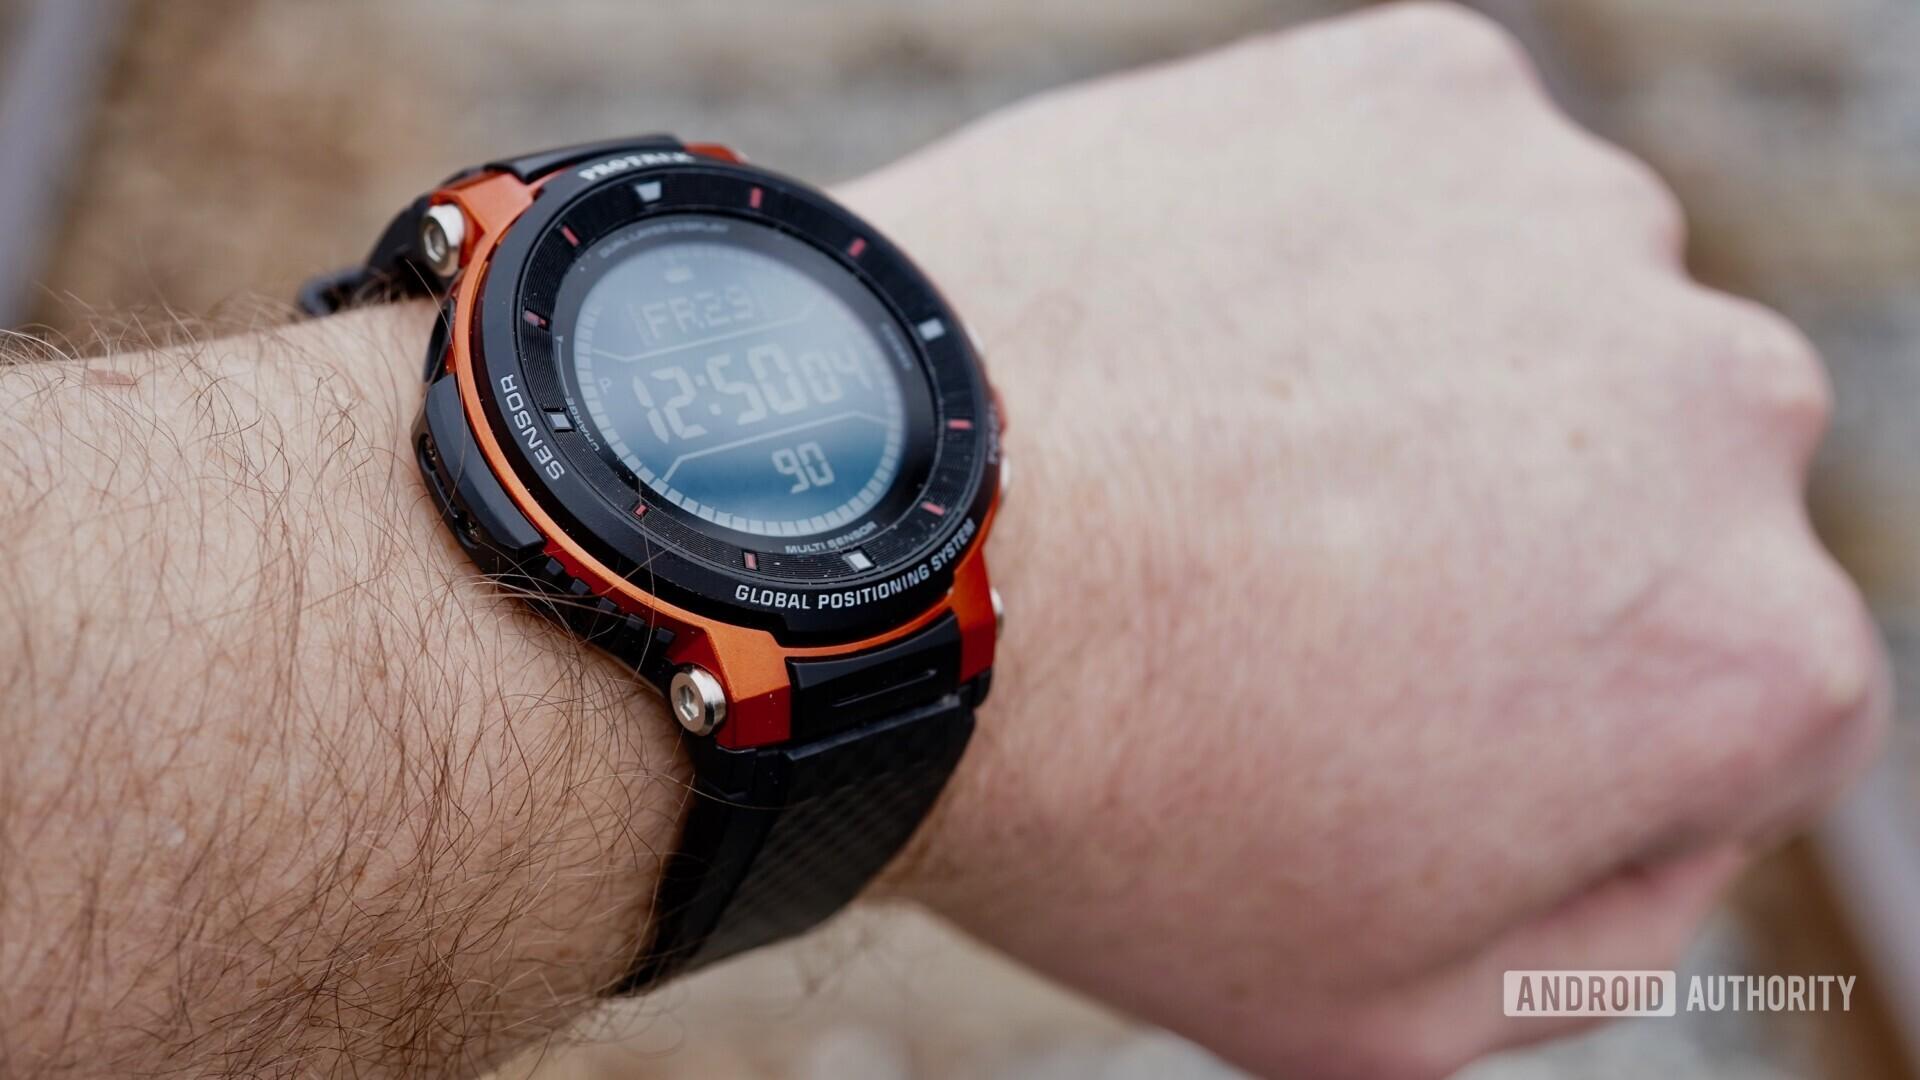 Casio Pro Trek WSD-F30 on wrist